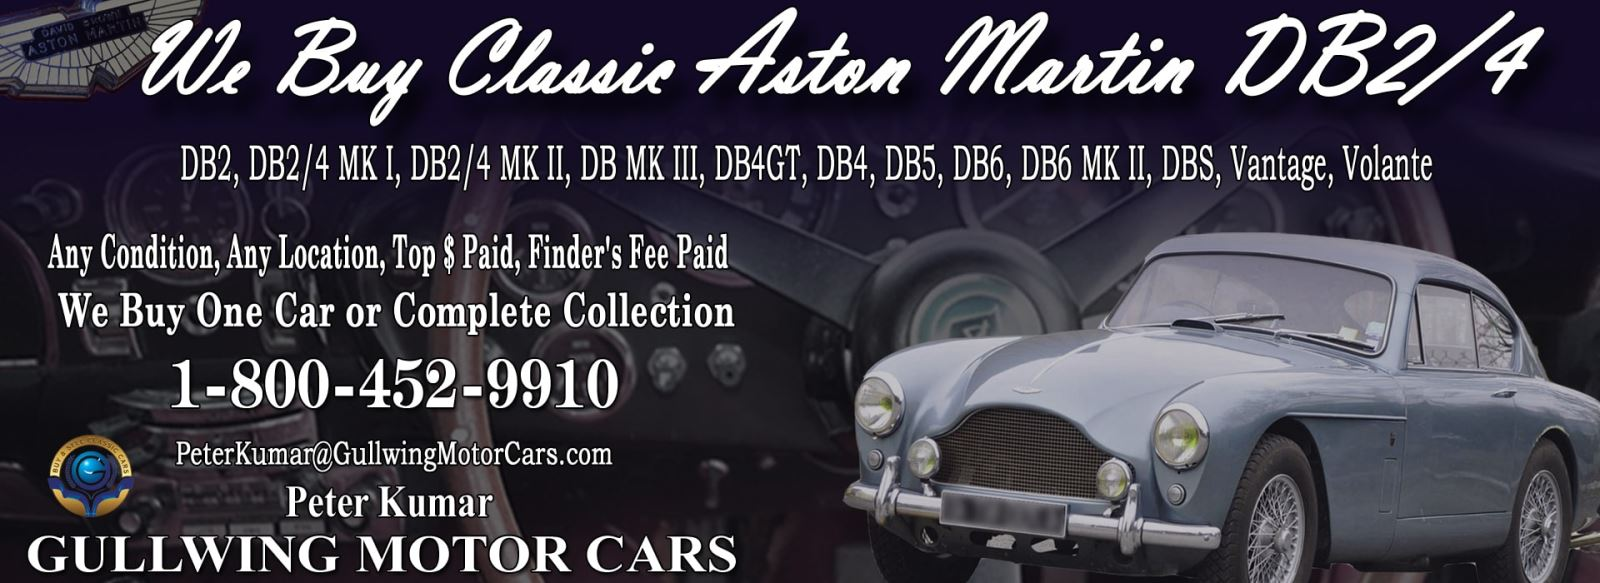 Classic Aston Martin DB2-4 for sale, we buy vintage Aston Martin DB2/4. Call Peter Kumar. Gullwing Motor